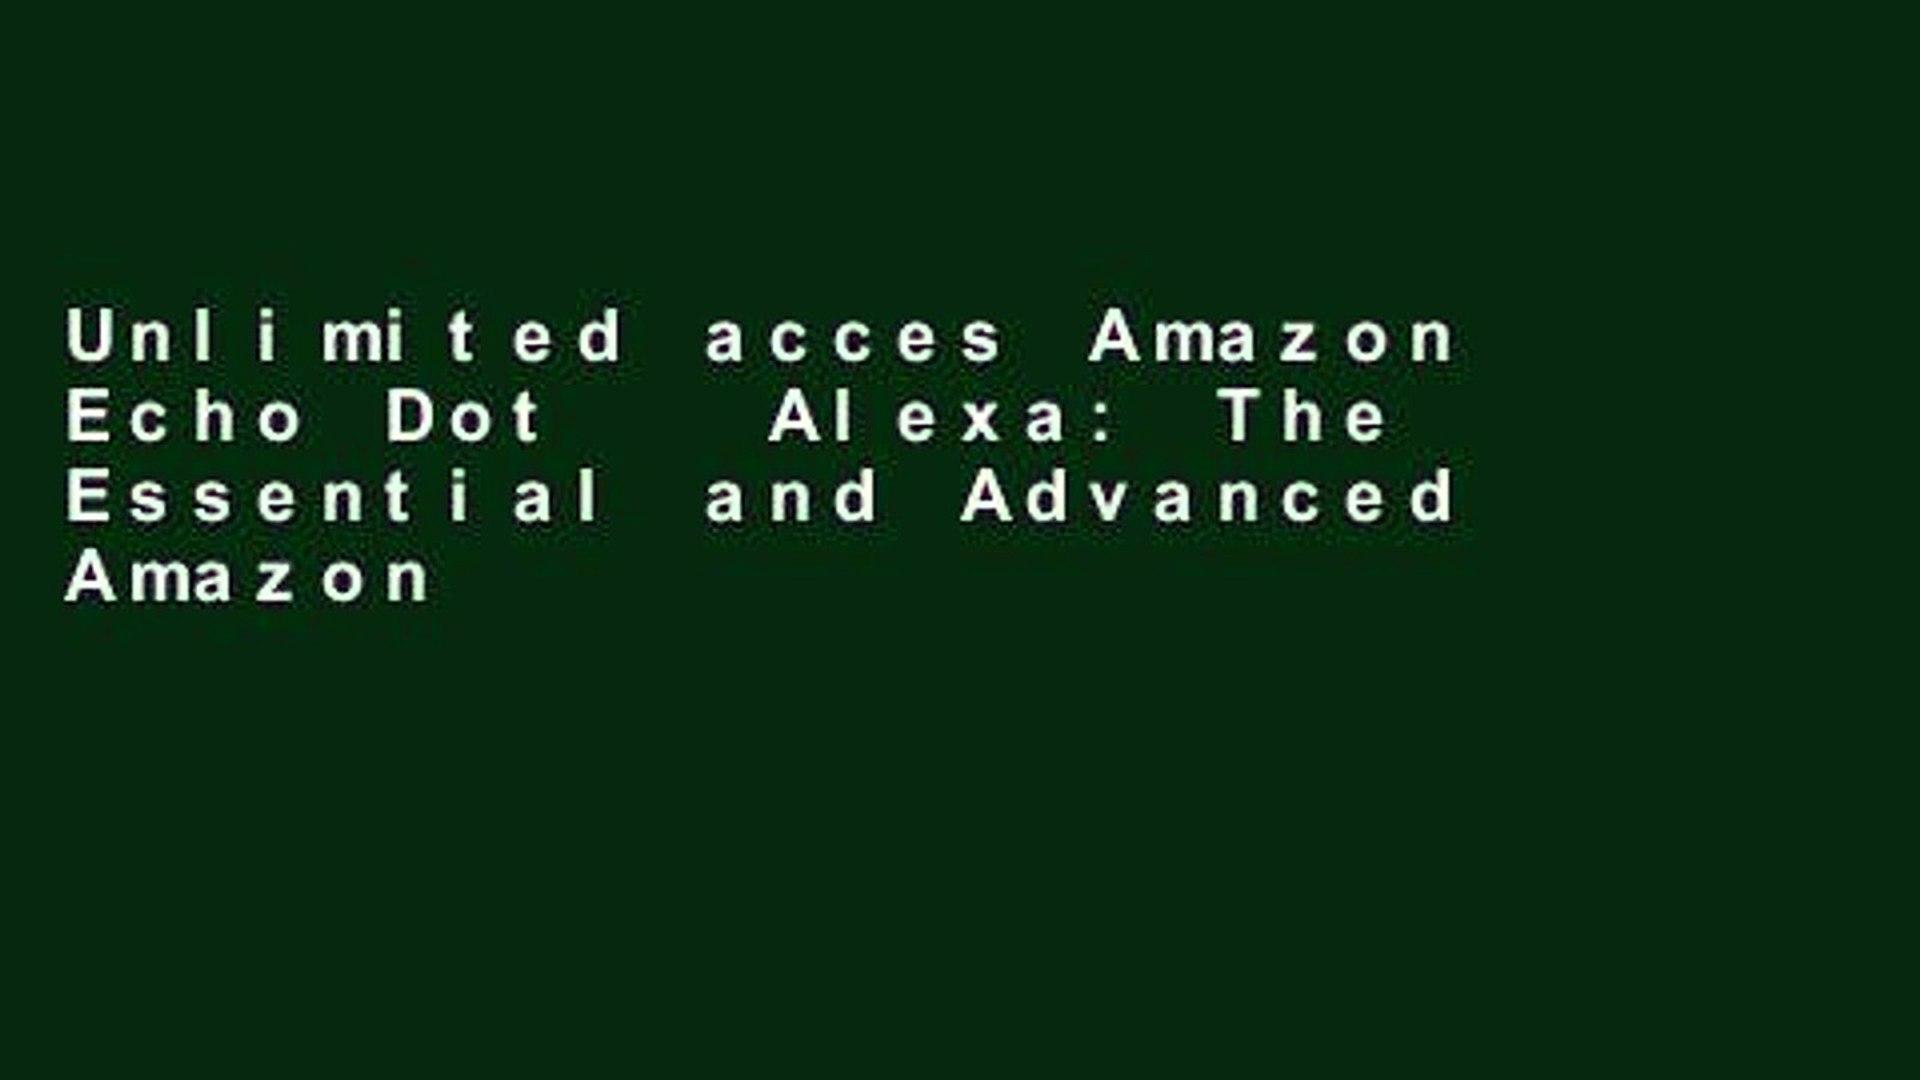 Unlimited acces Amazon Echo Dot   Alexa: The Essential and Advanced Amazon Echo Dot and Alexa User